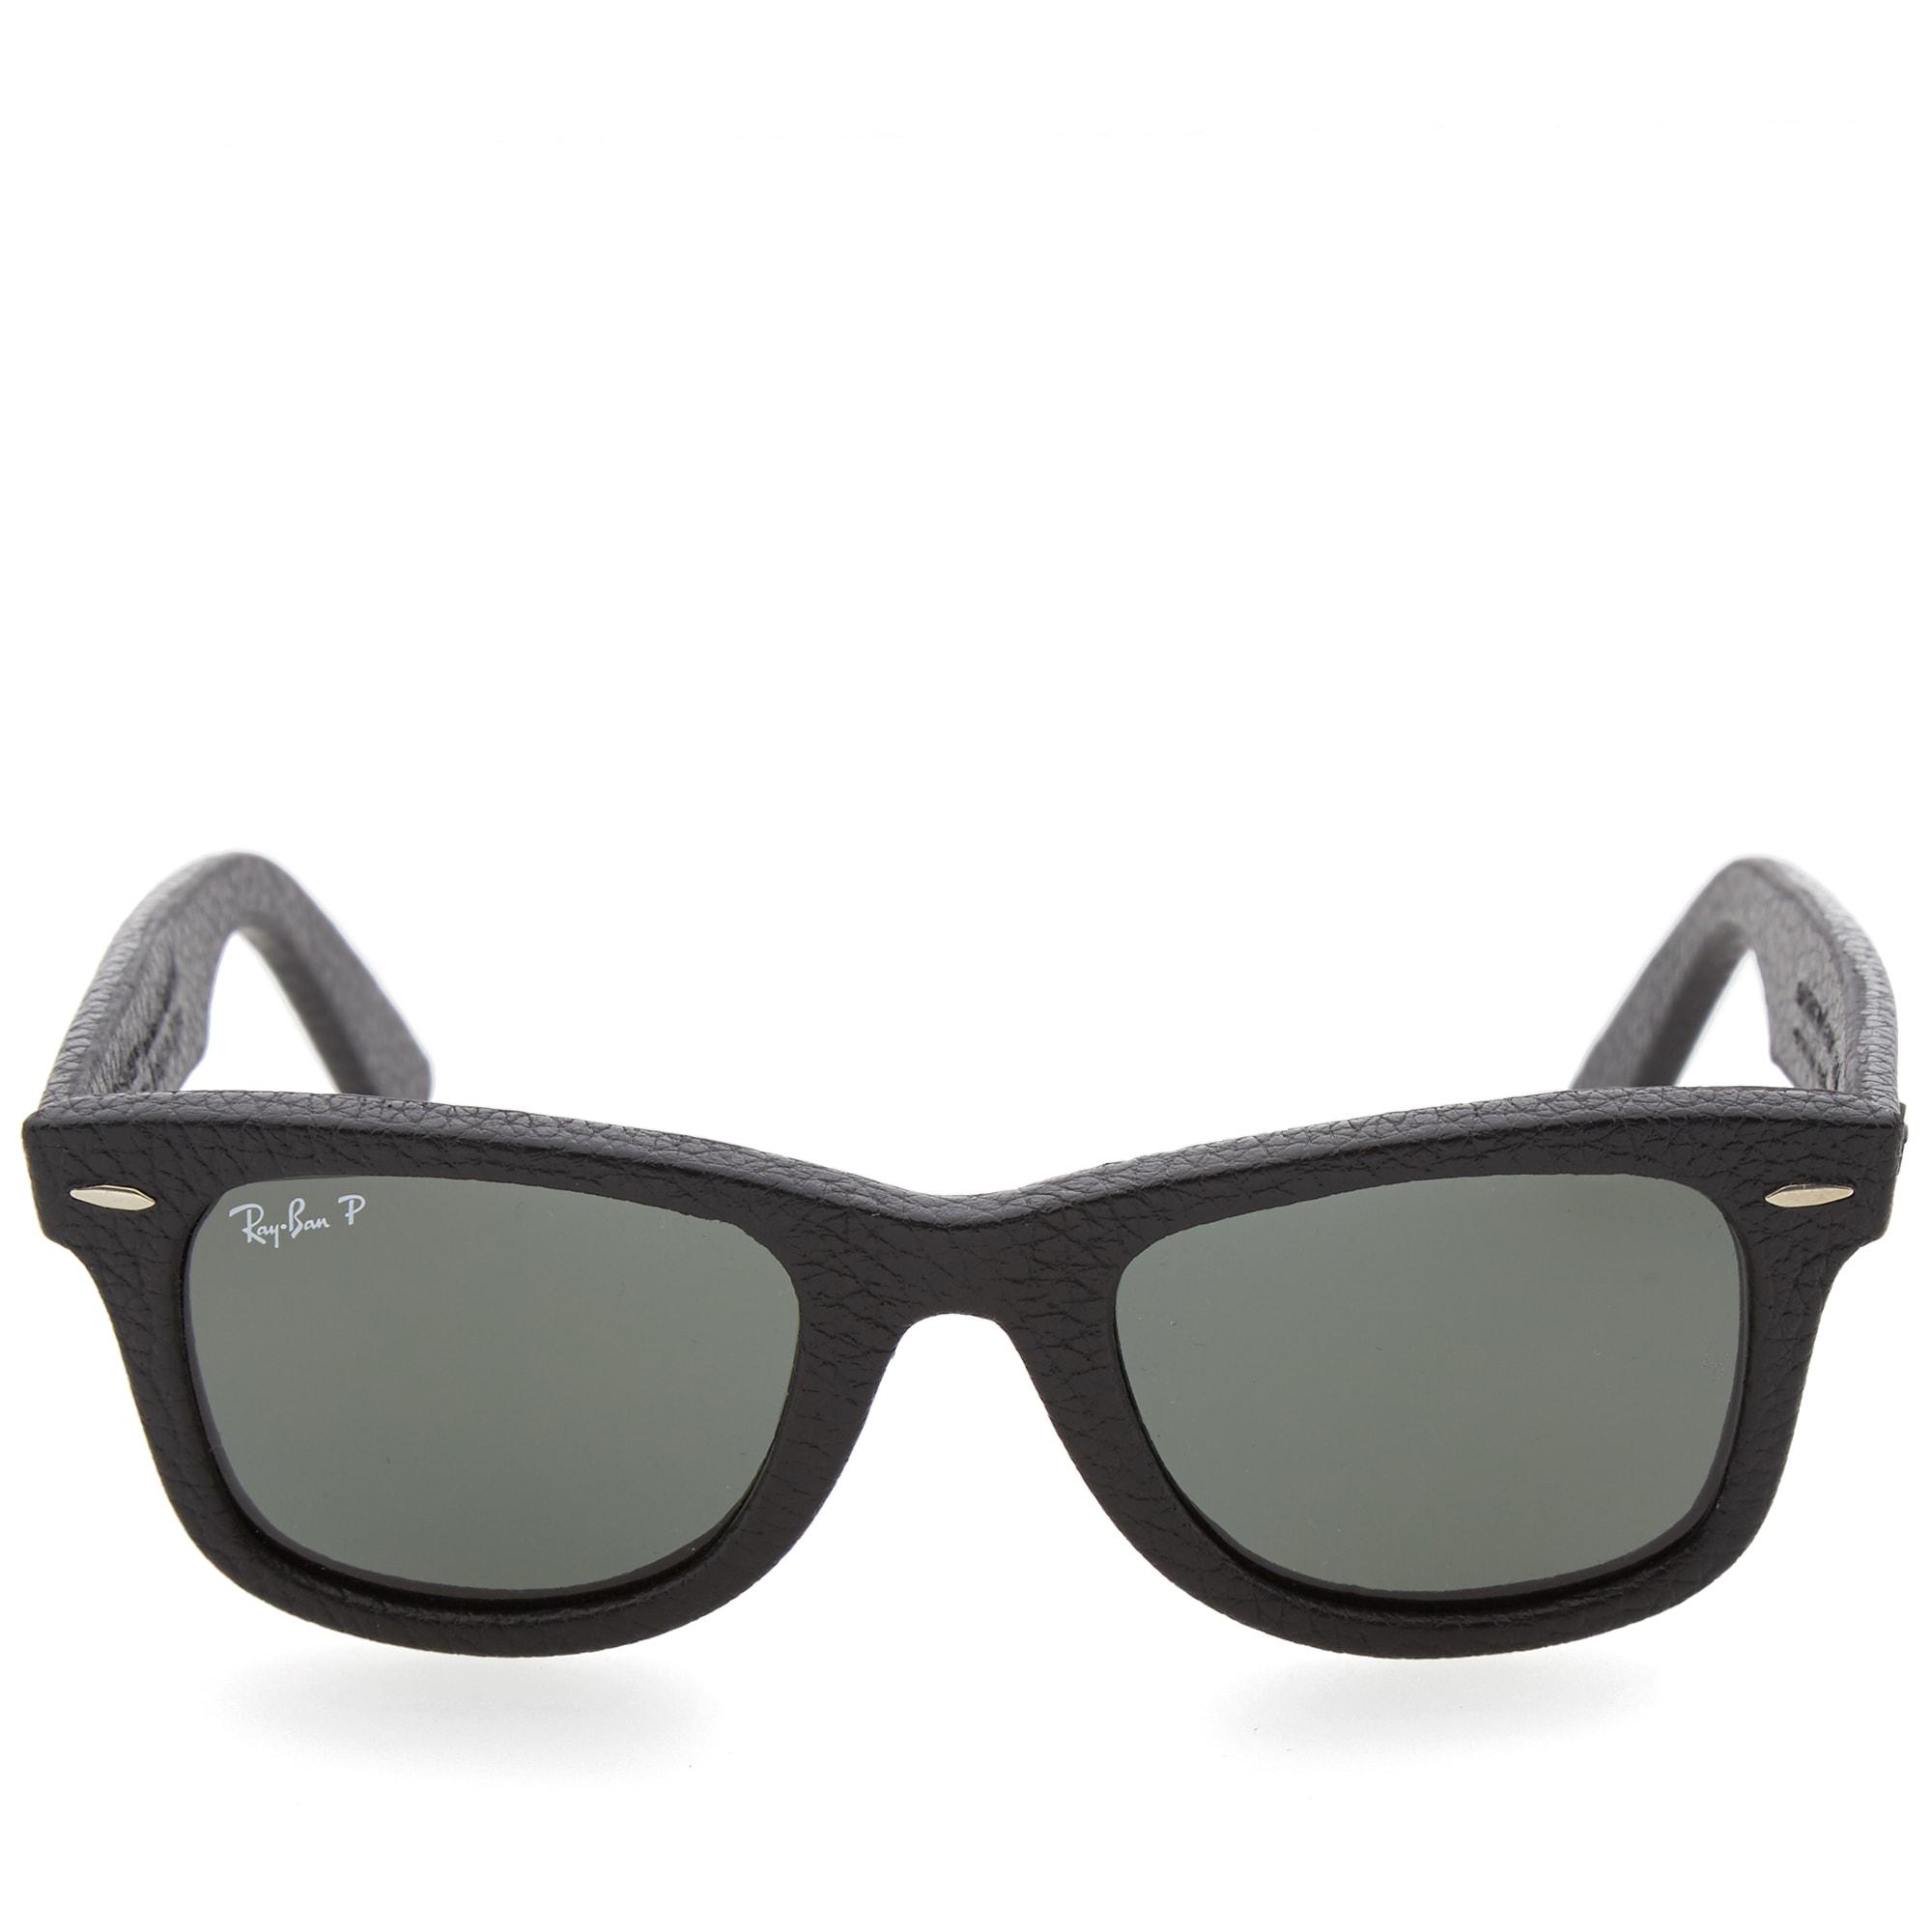 ddf97318404c Ray Ban Wayfarer Leather Sunglasses Black   Polarised Green